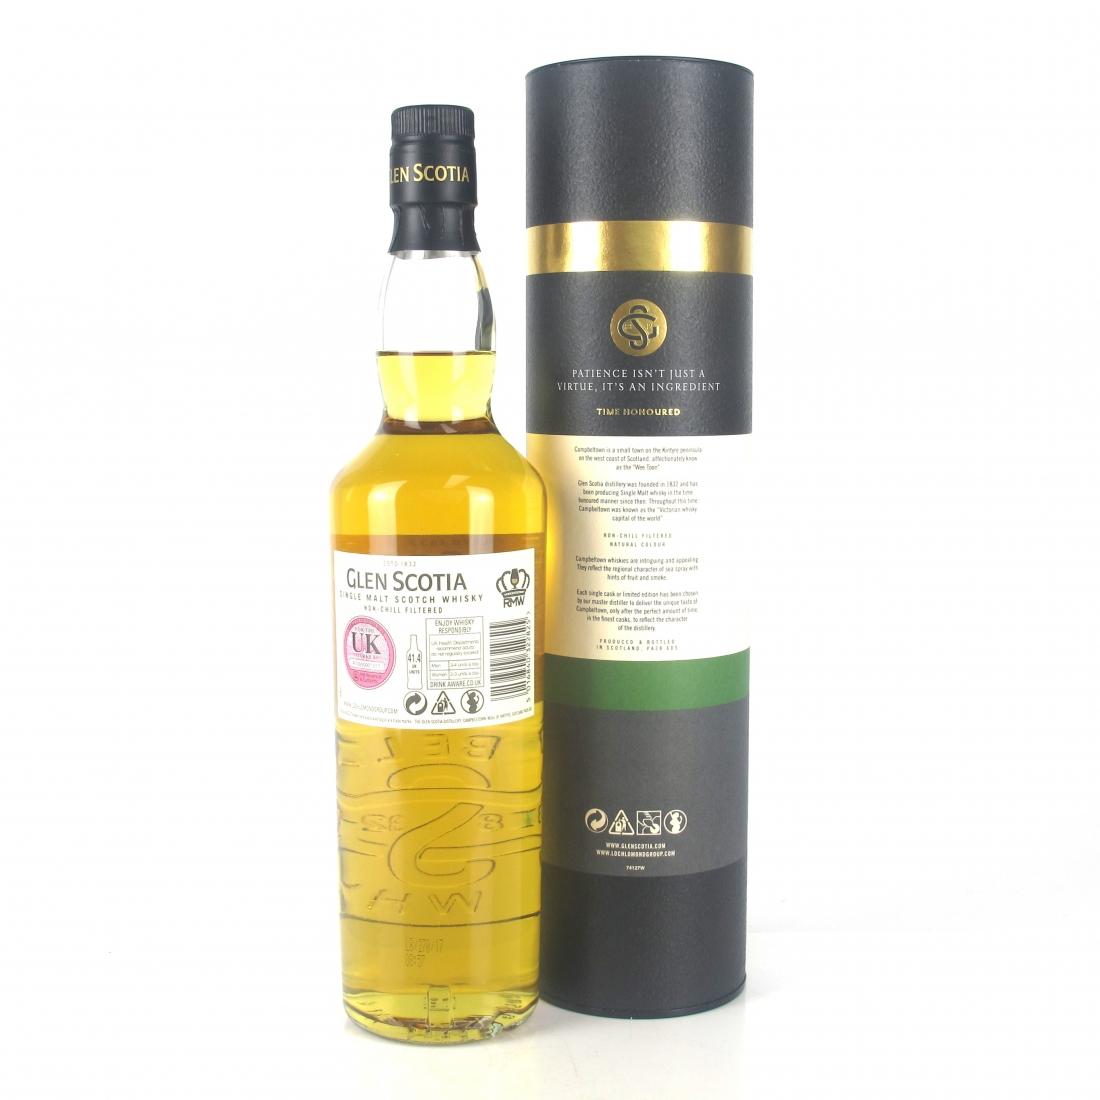 Glen Scotia 2007 Single Cask #178 / Royal Mile Whiskies Exclusive